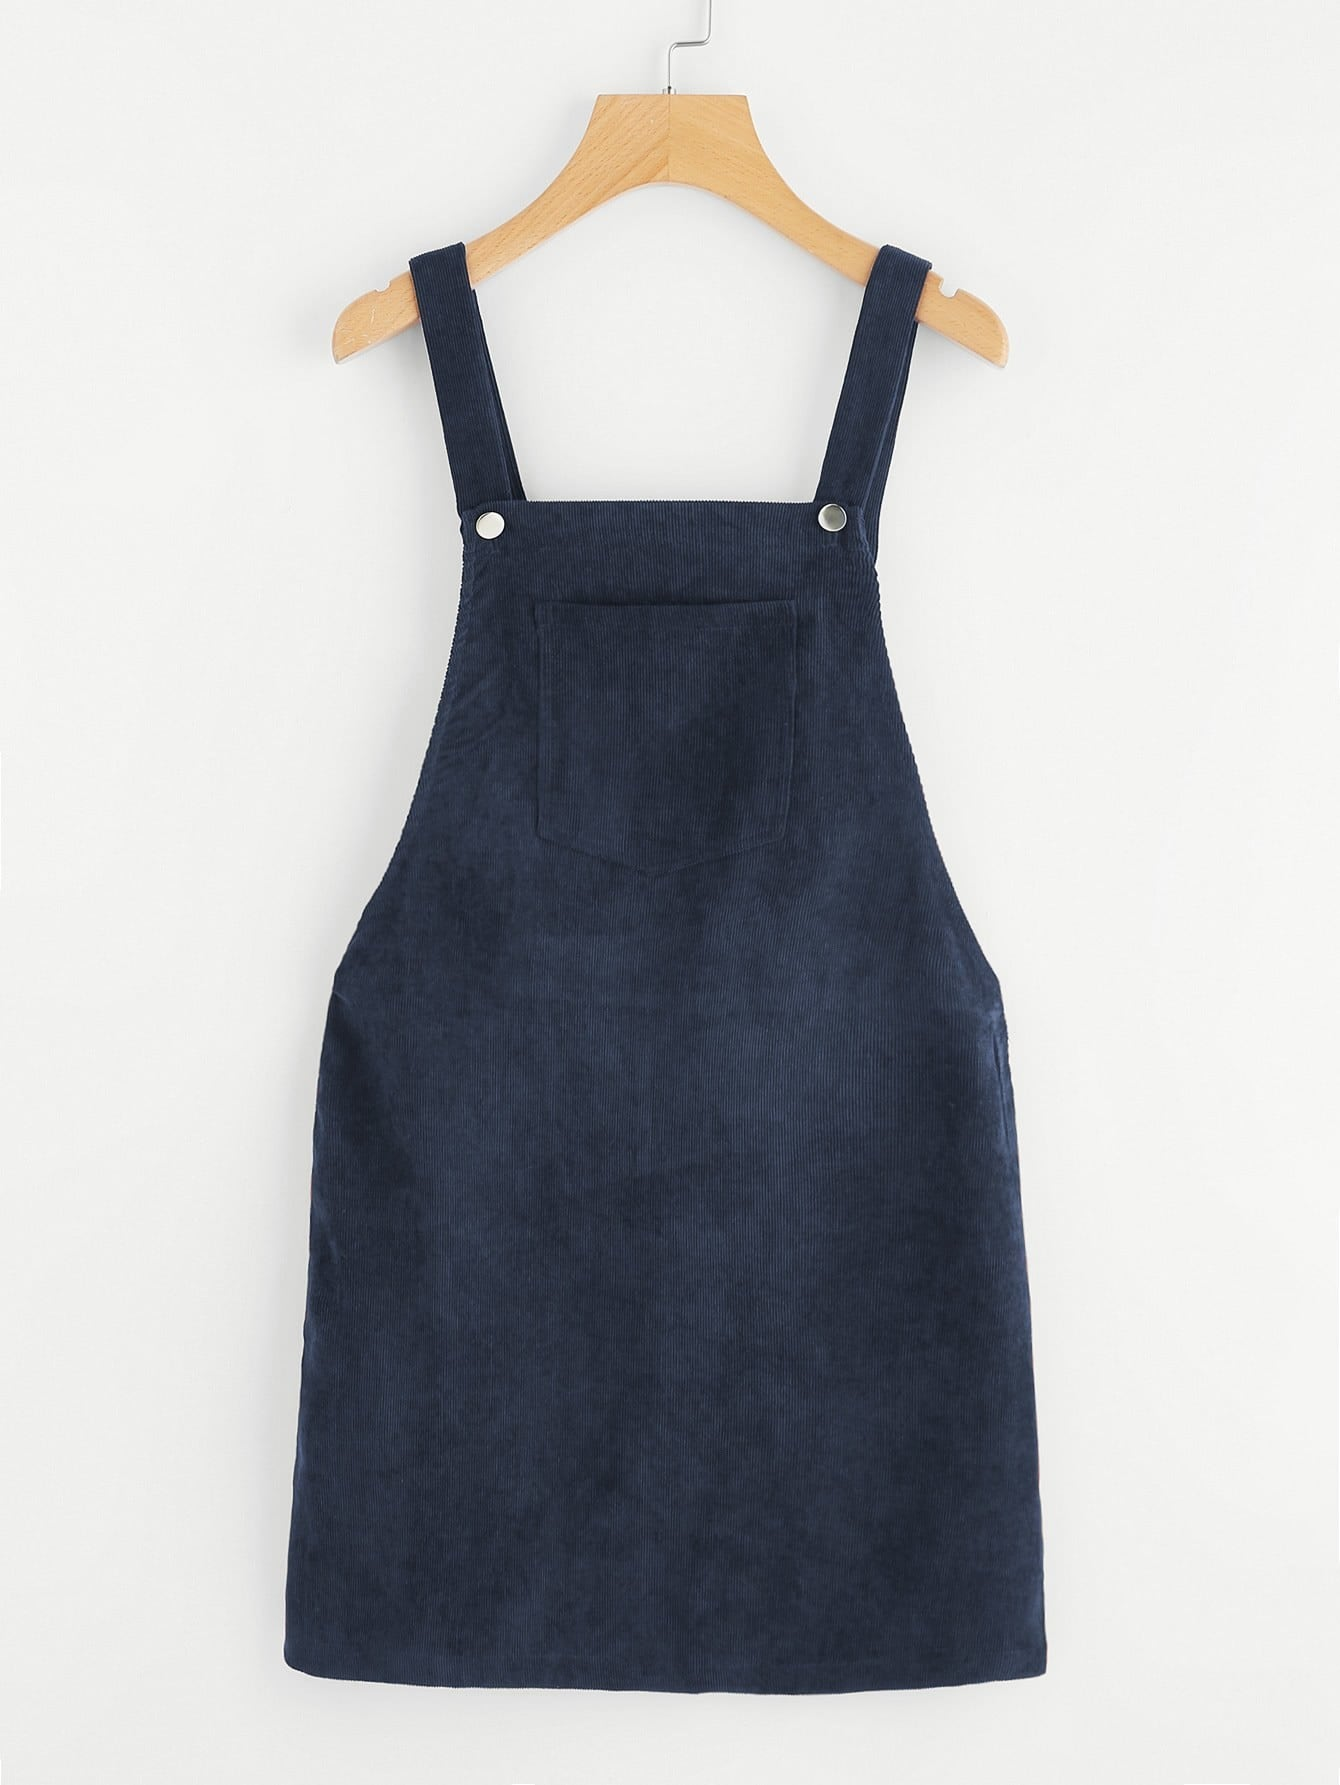 Bib Pocket Front Overall Dress overall yumi overall